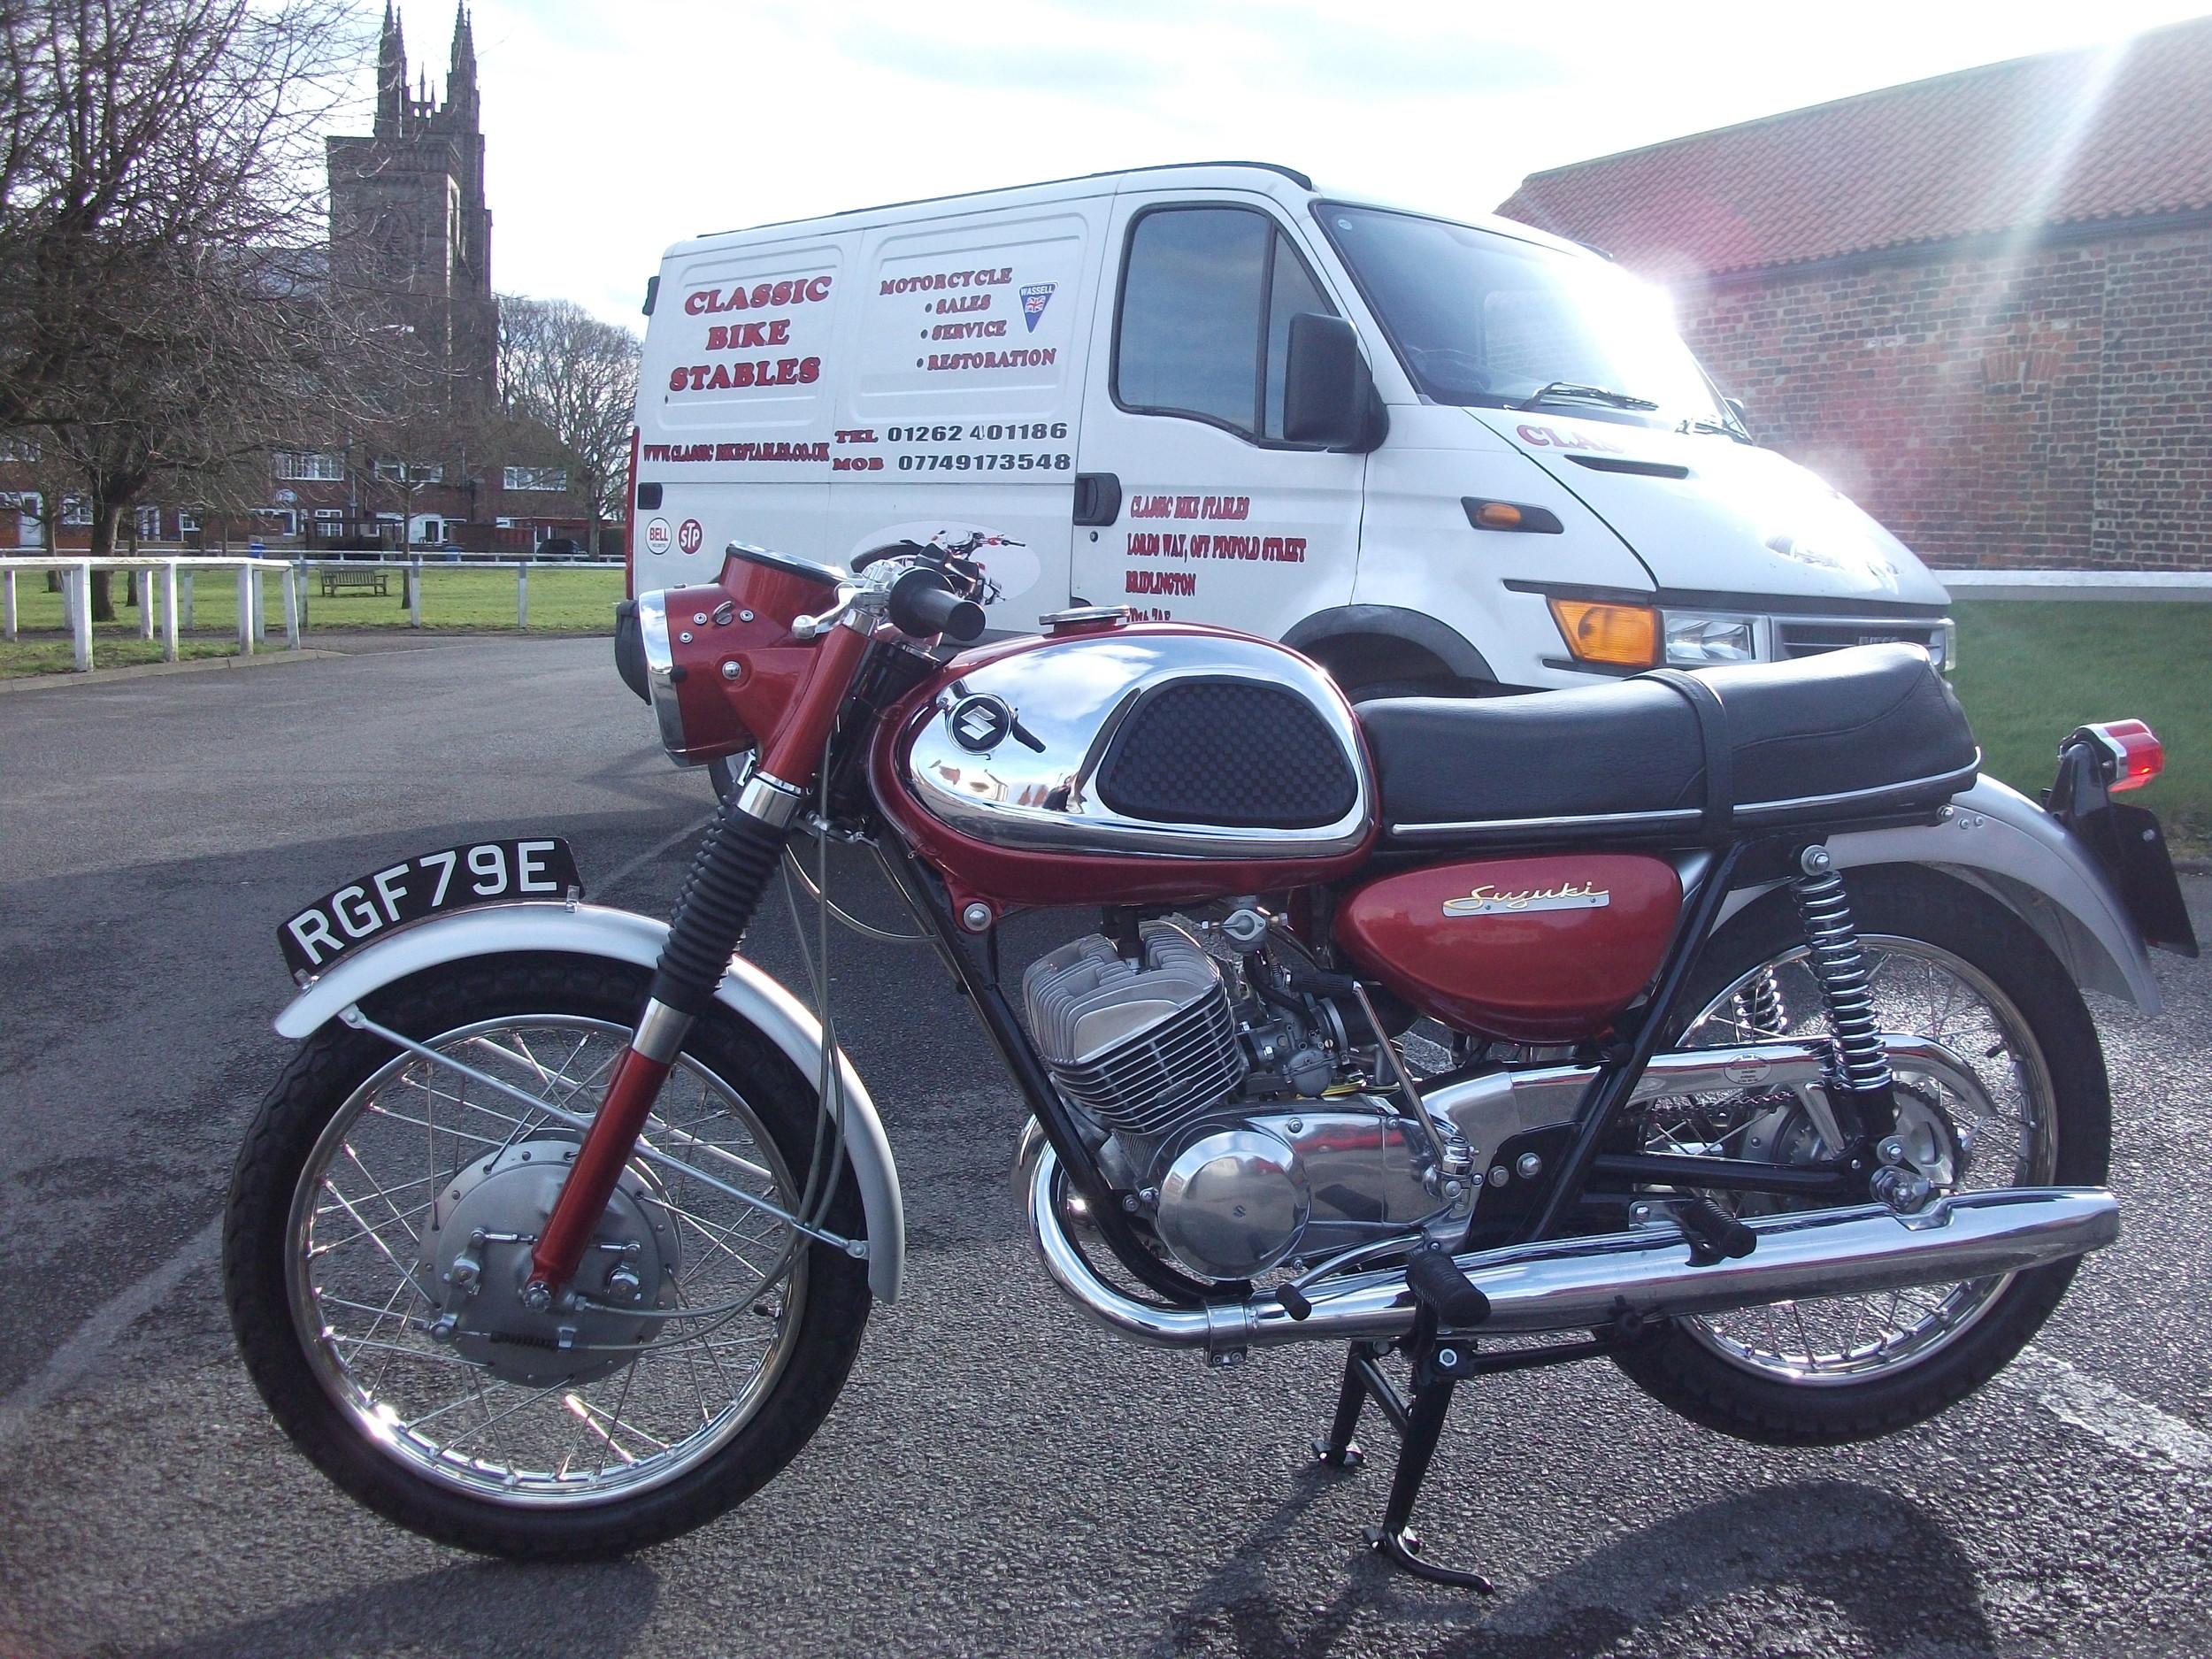 Complete restoration of a 1967 Suzuki T20 Super Six,